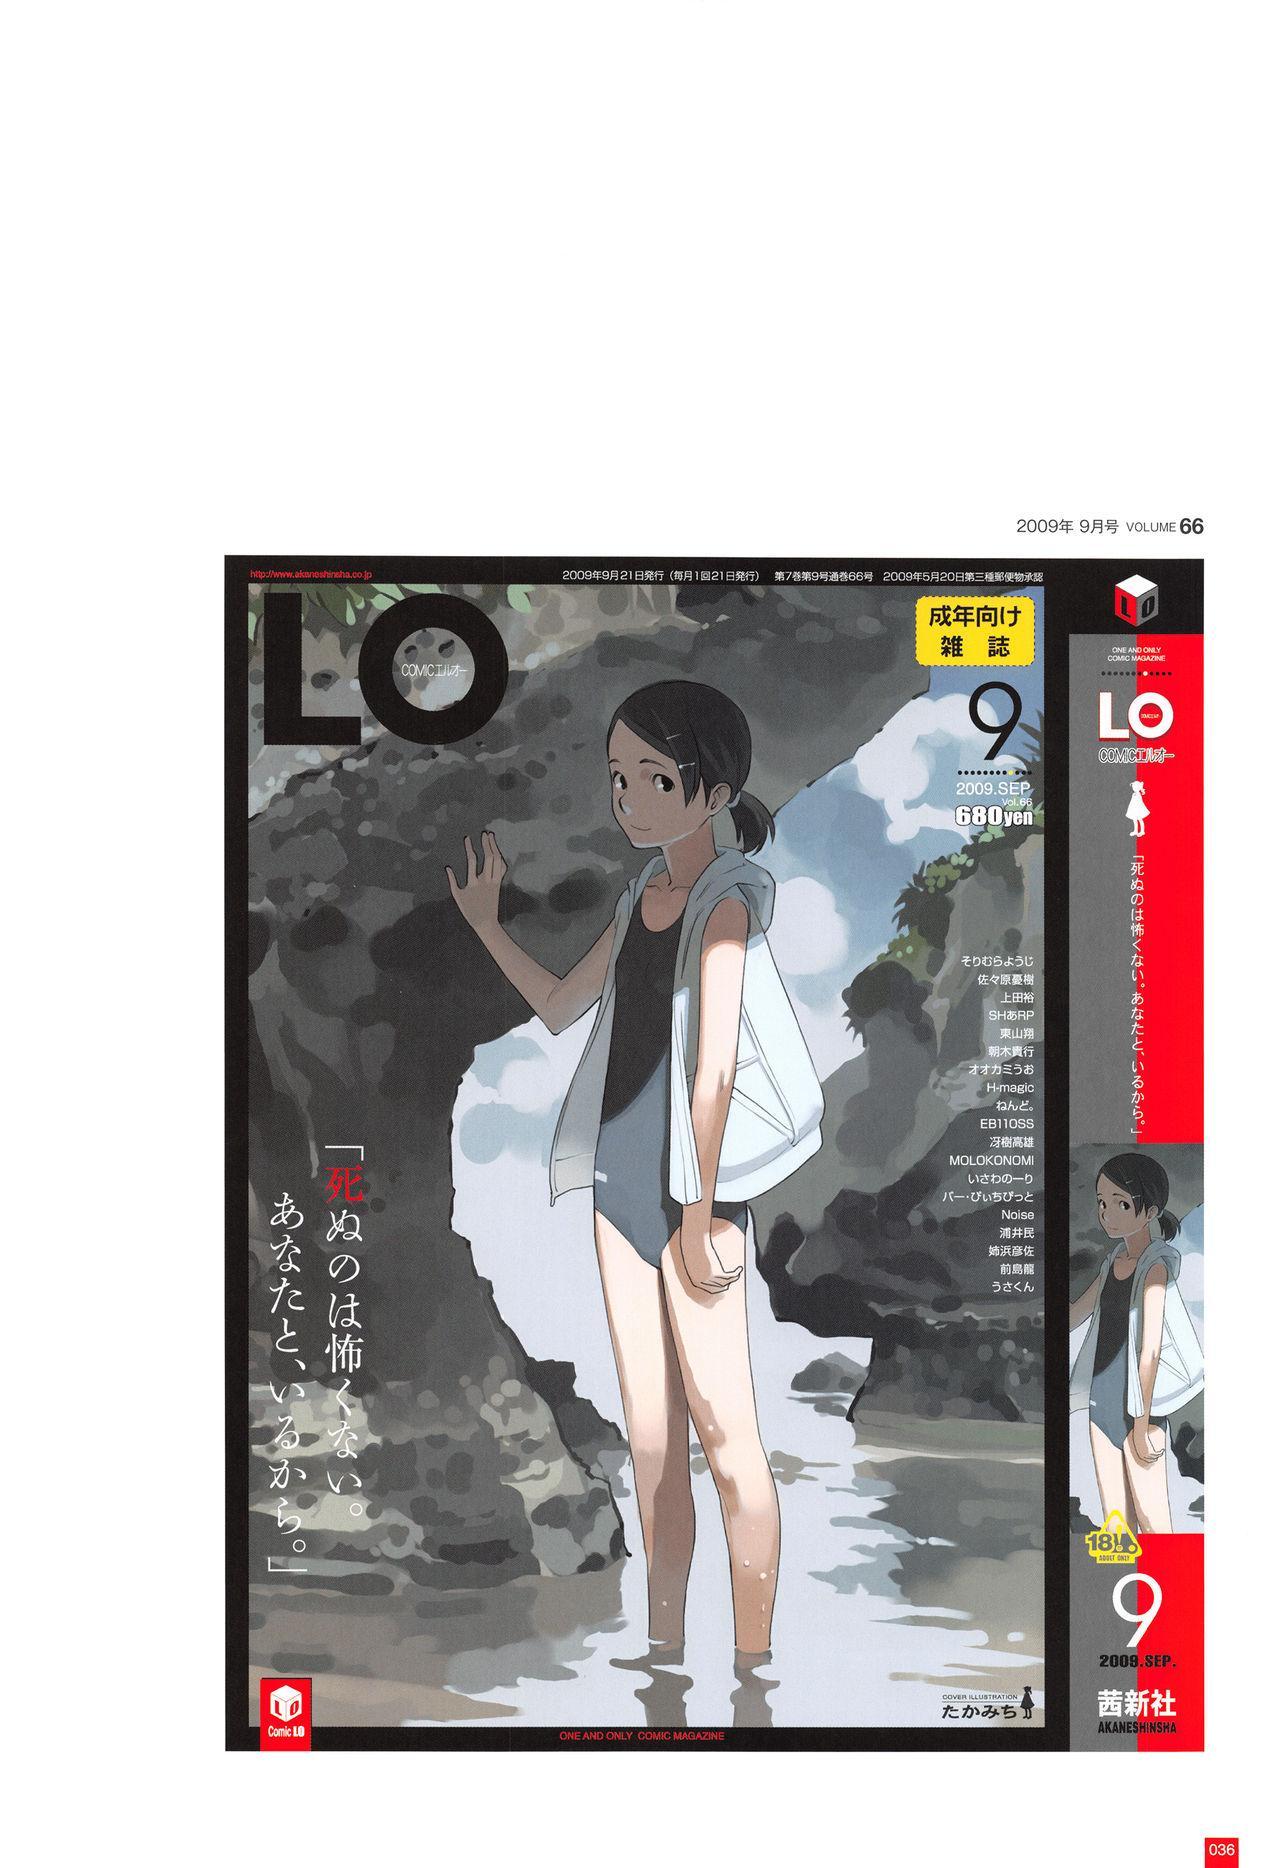 LO Artbook 2-A TAKAMICHI LOOP WORKS 38